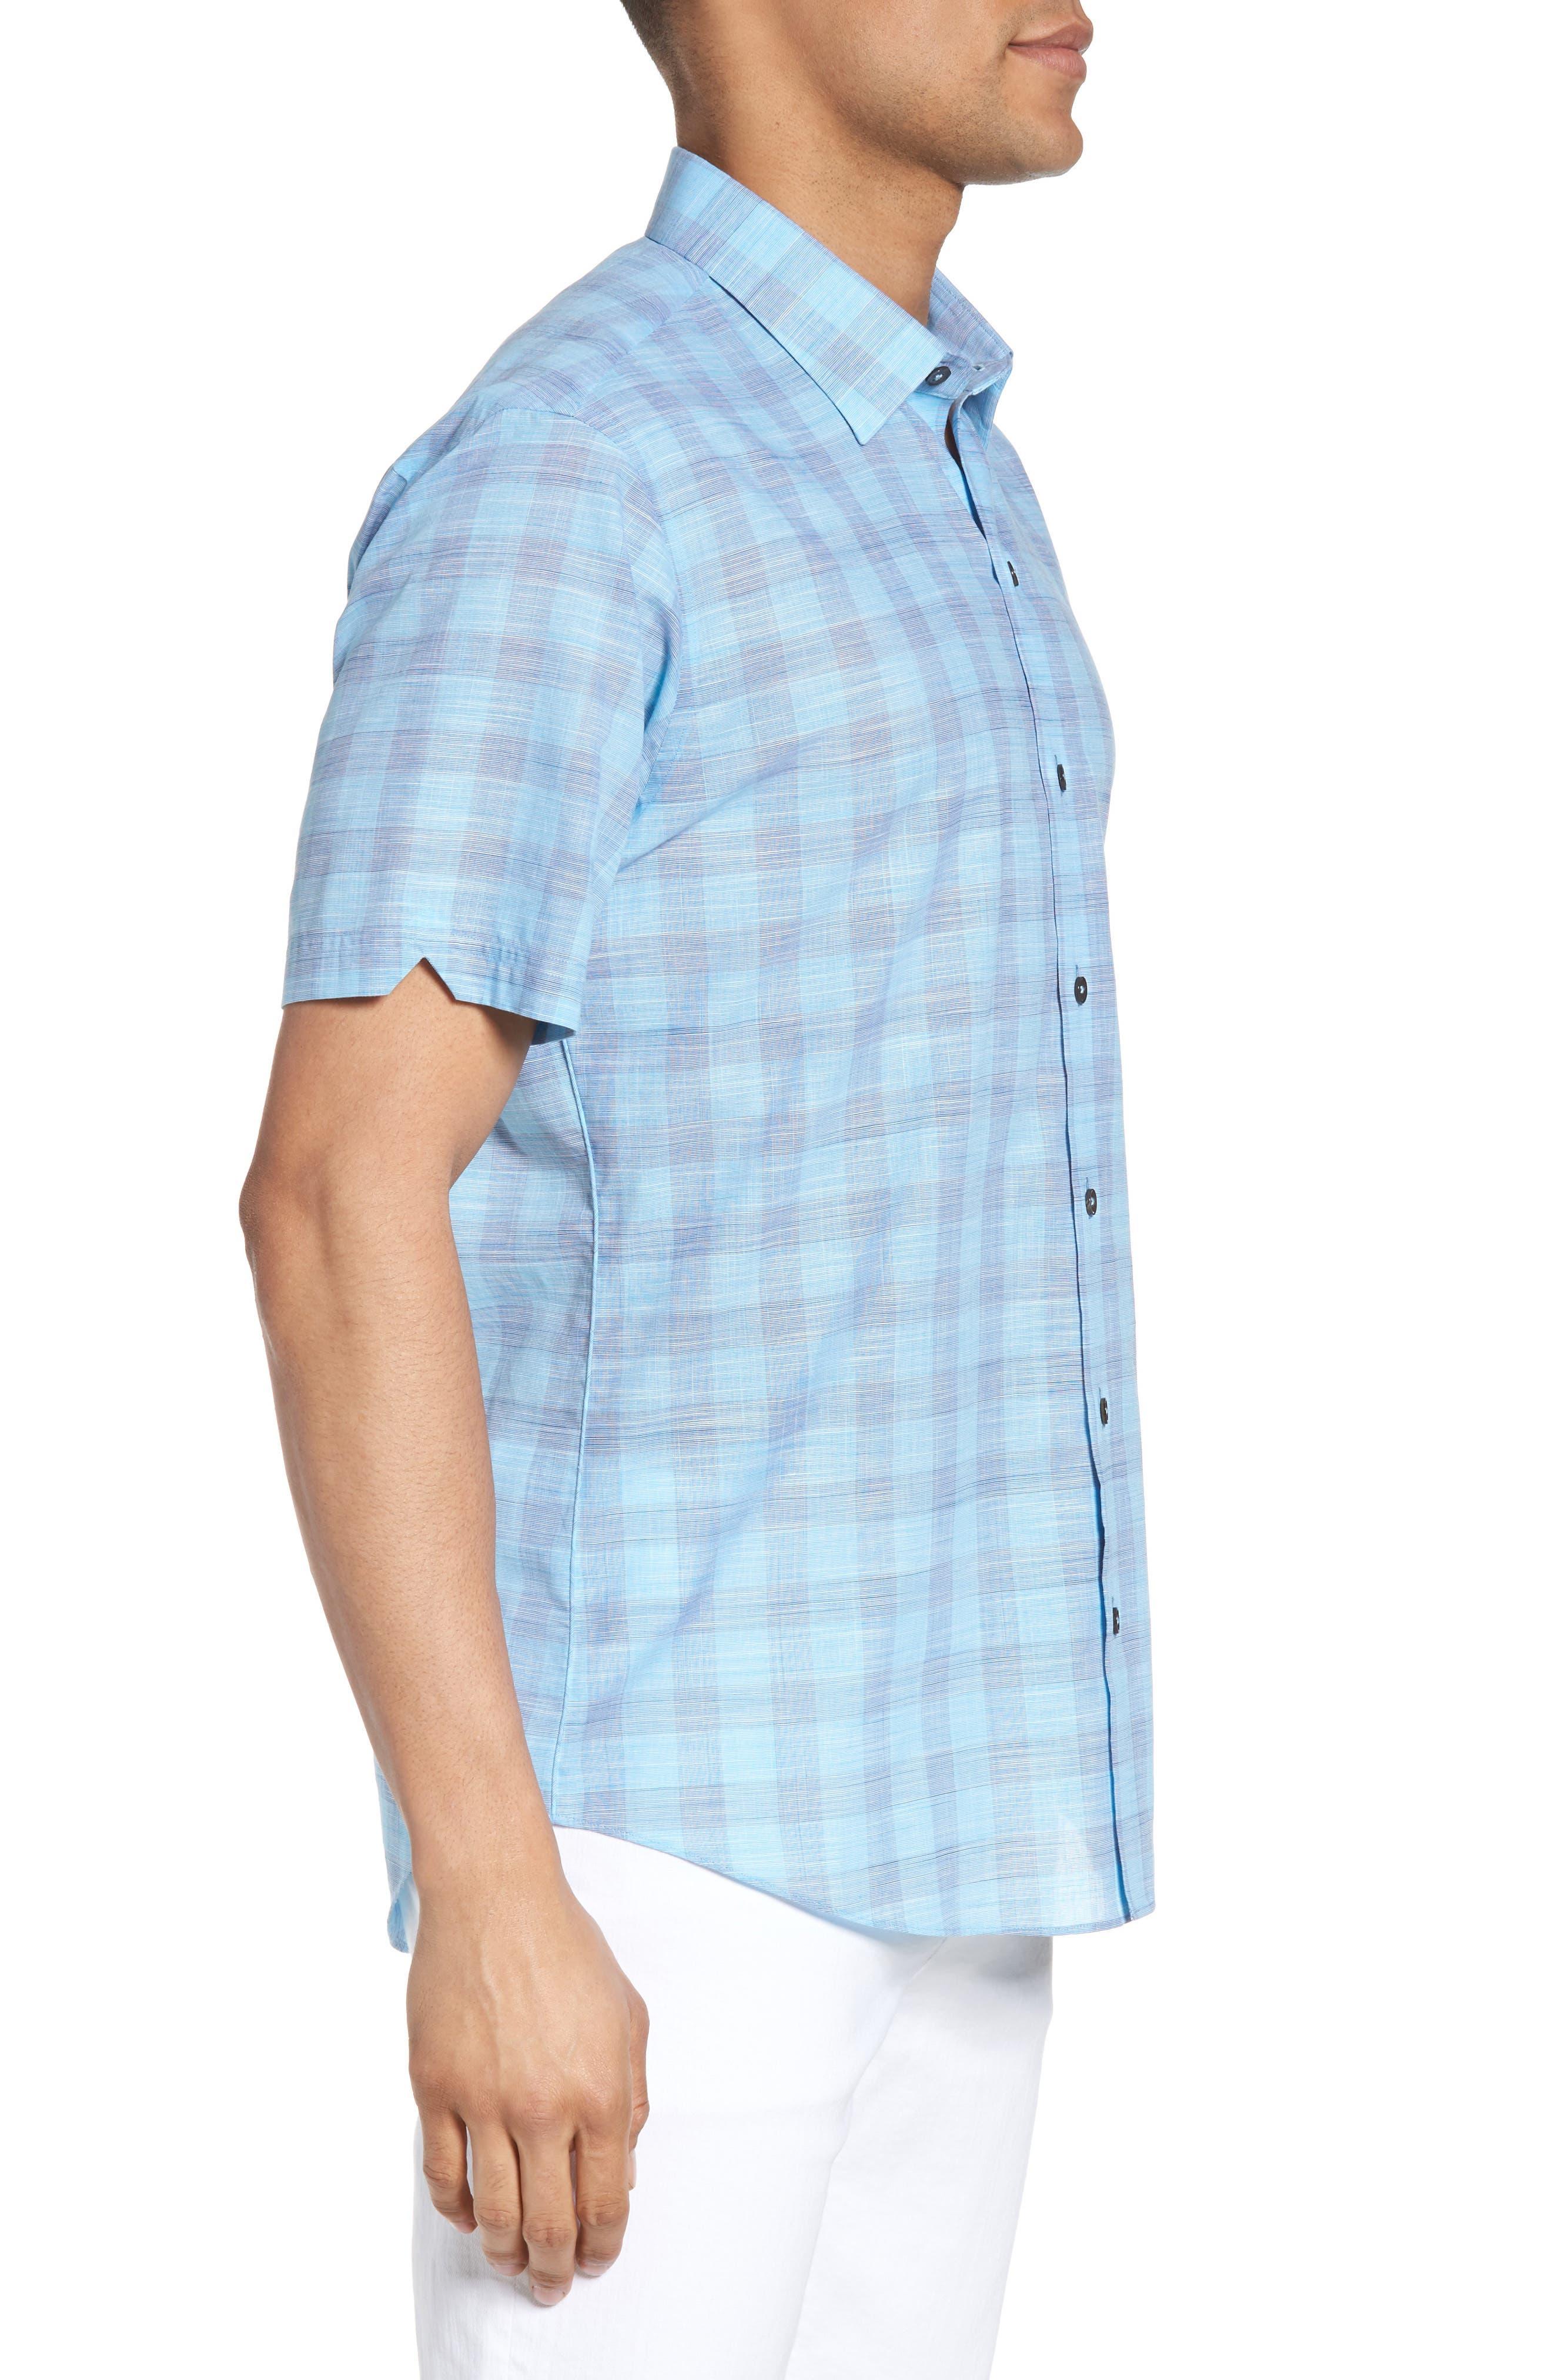 Hasanagic Trim Fit Plaid Sport Shirt,                             Alternate thumbnail 3, color,                             Turquoise